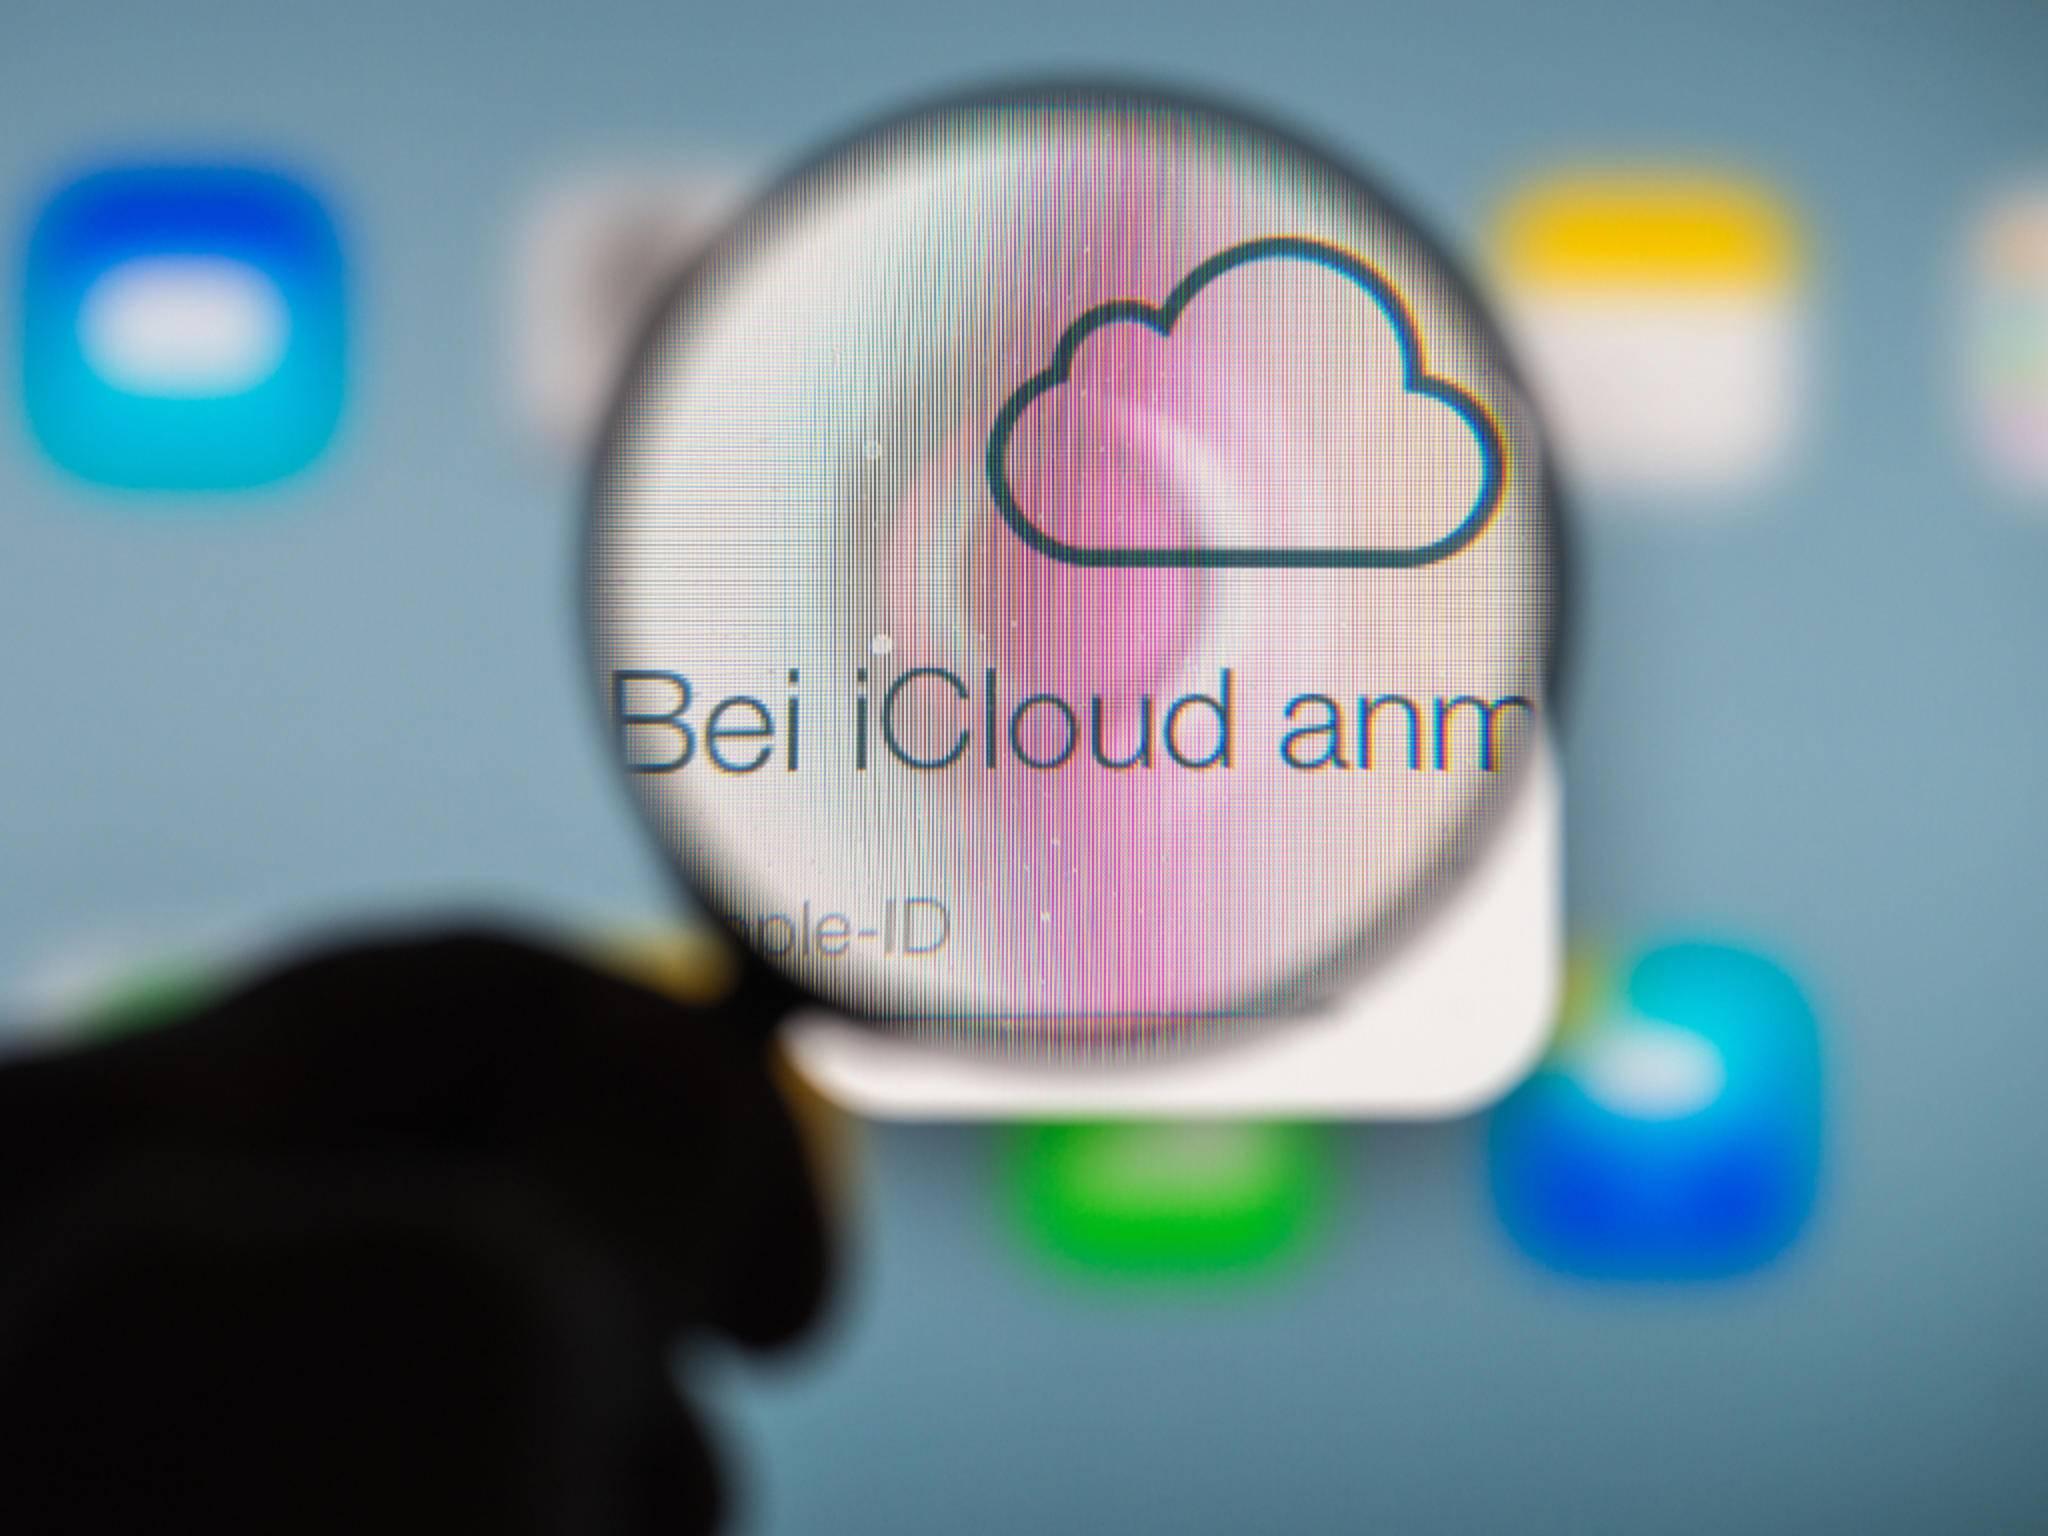 Apples iCloud eignet sich besonders für iOS-Geräte.